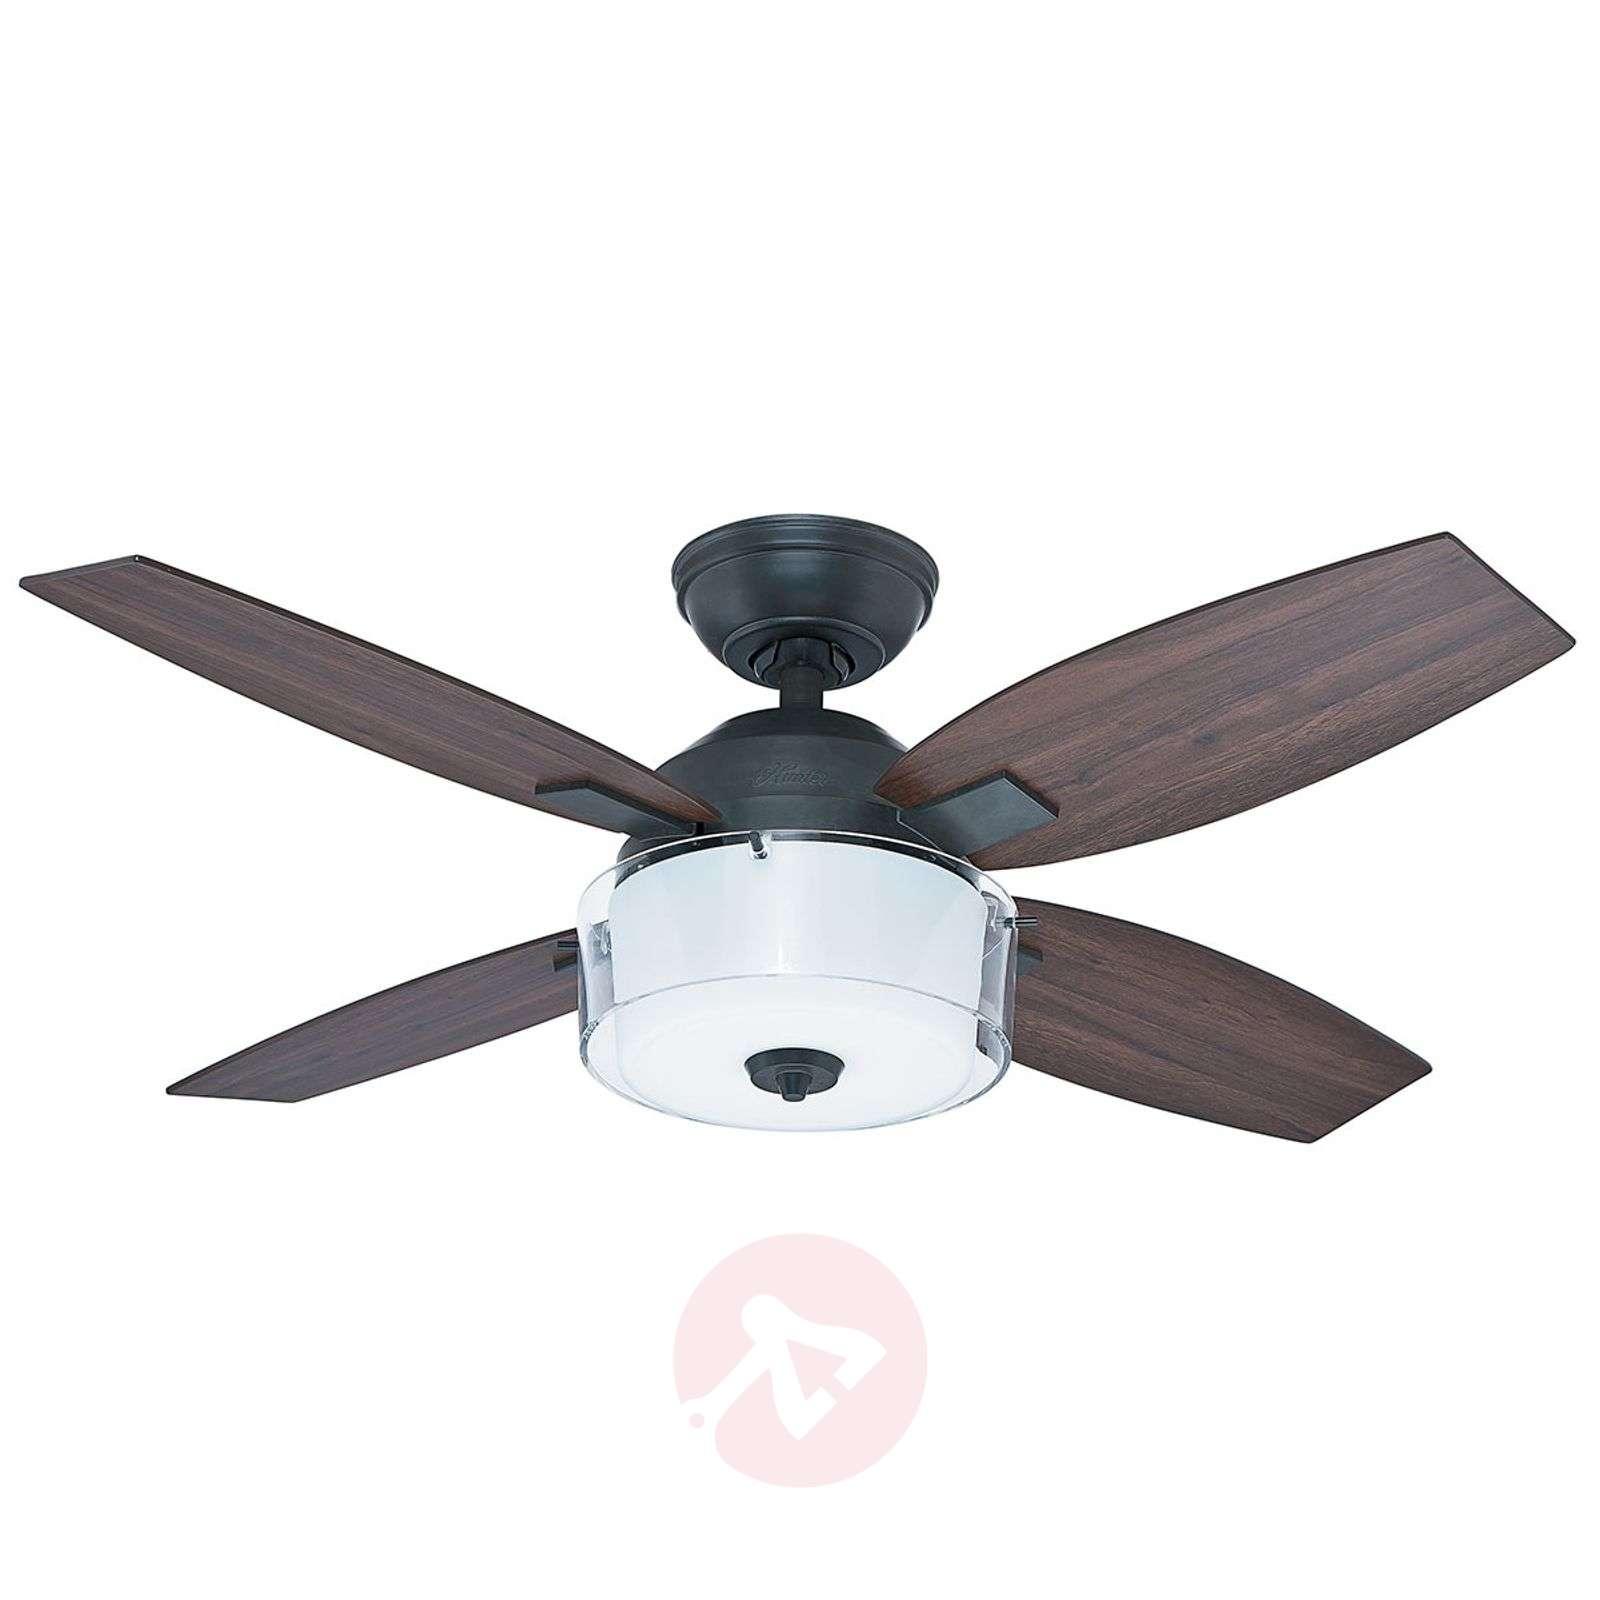 Hunter Central Park modern ceiling fan-4545015-01